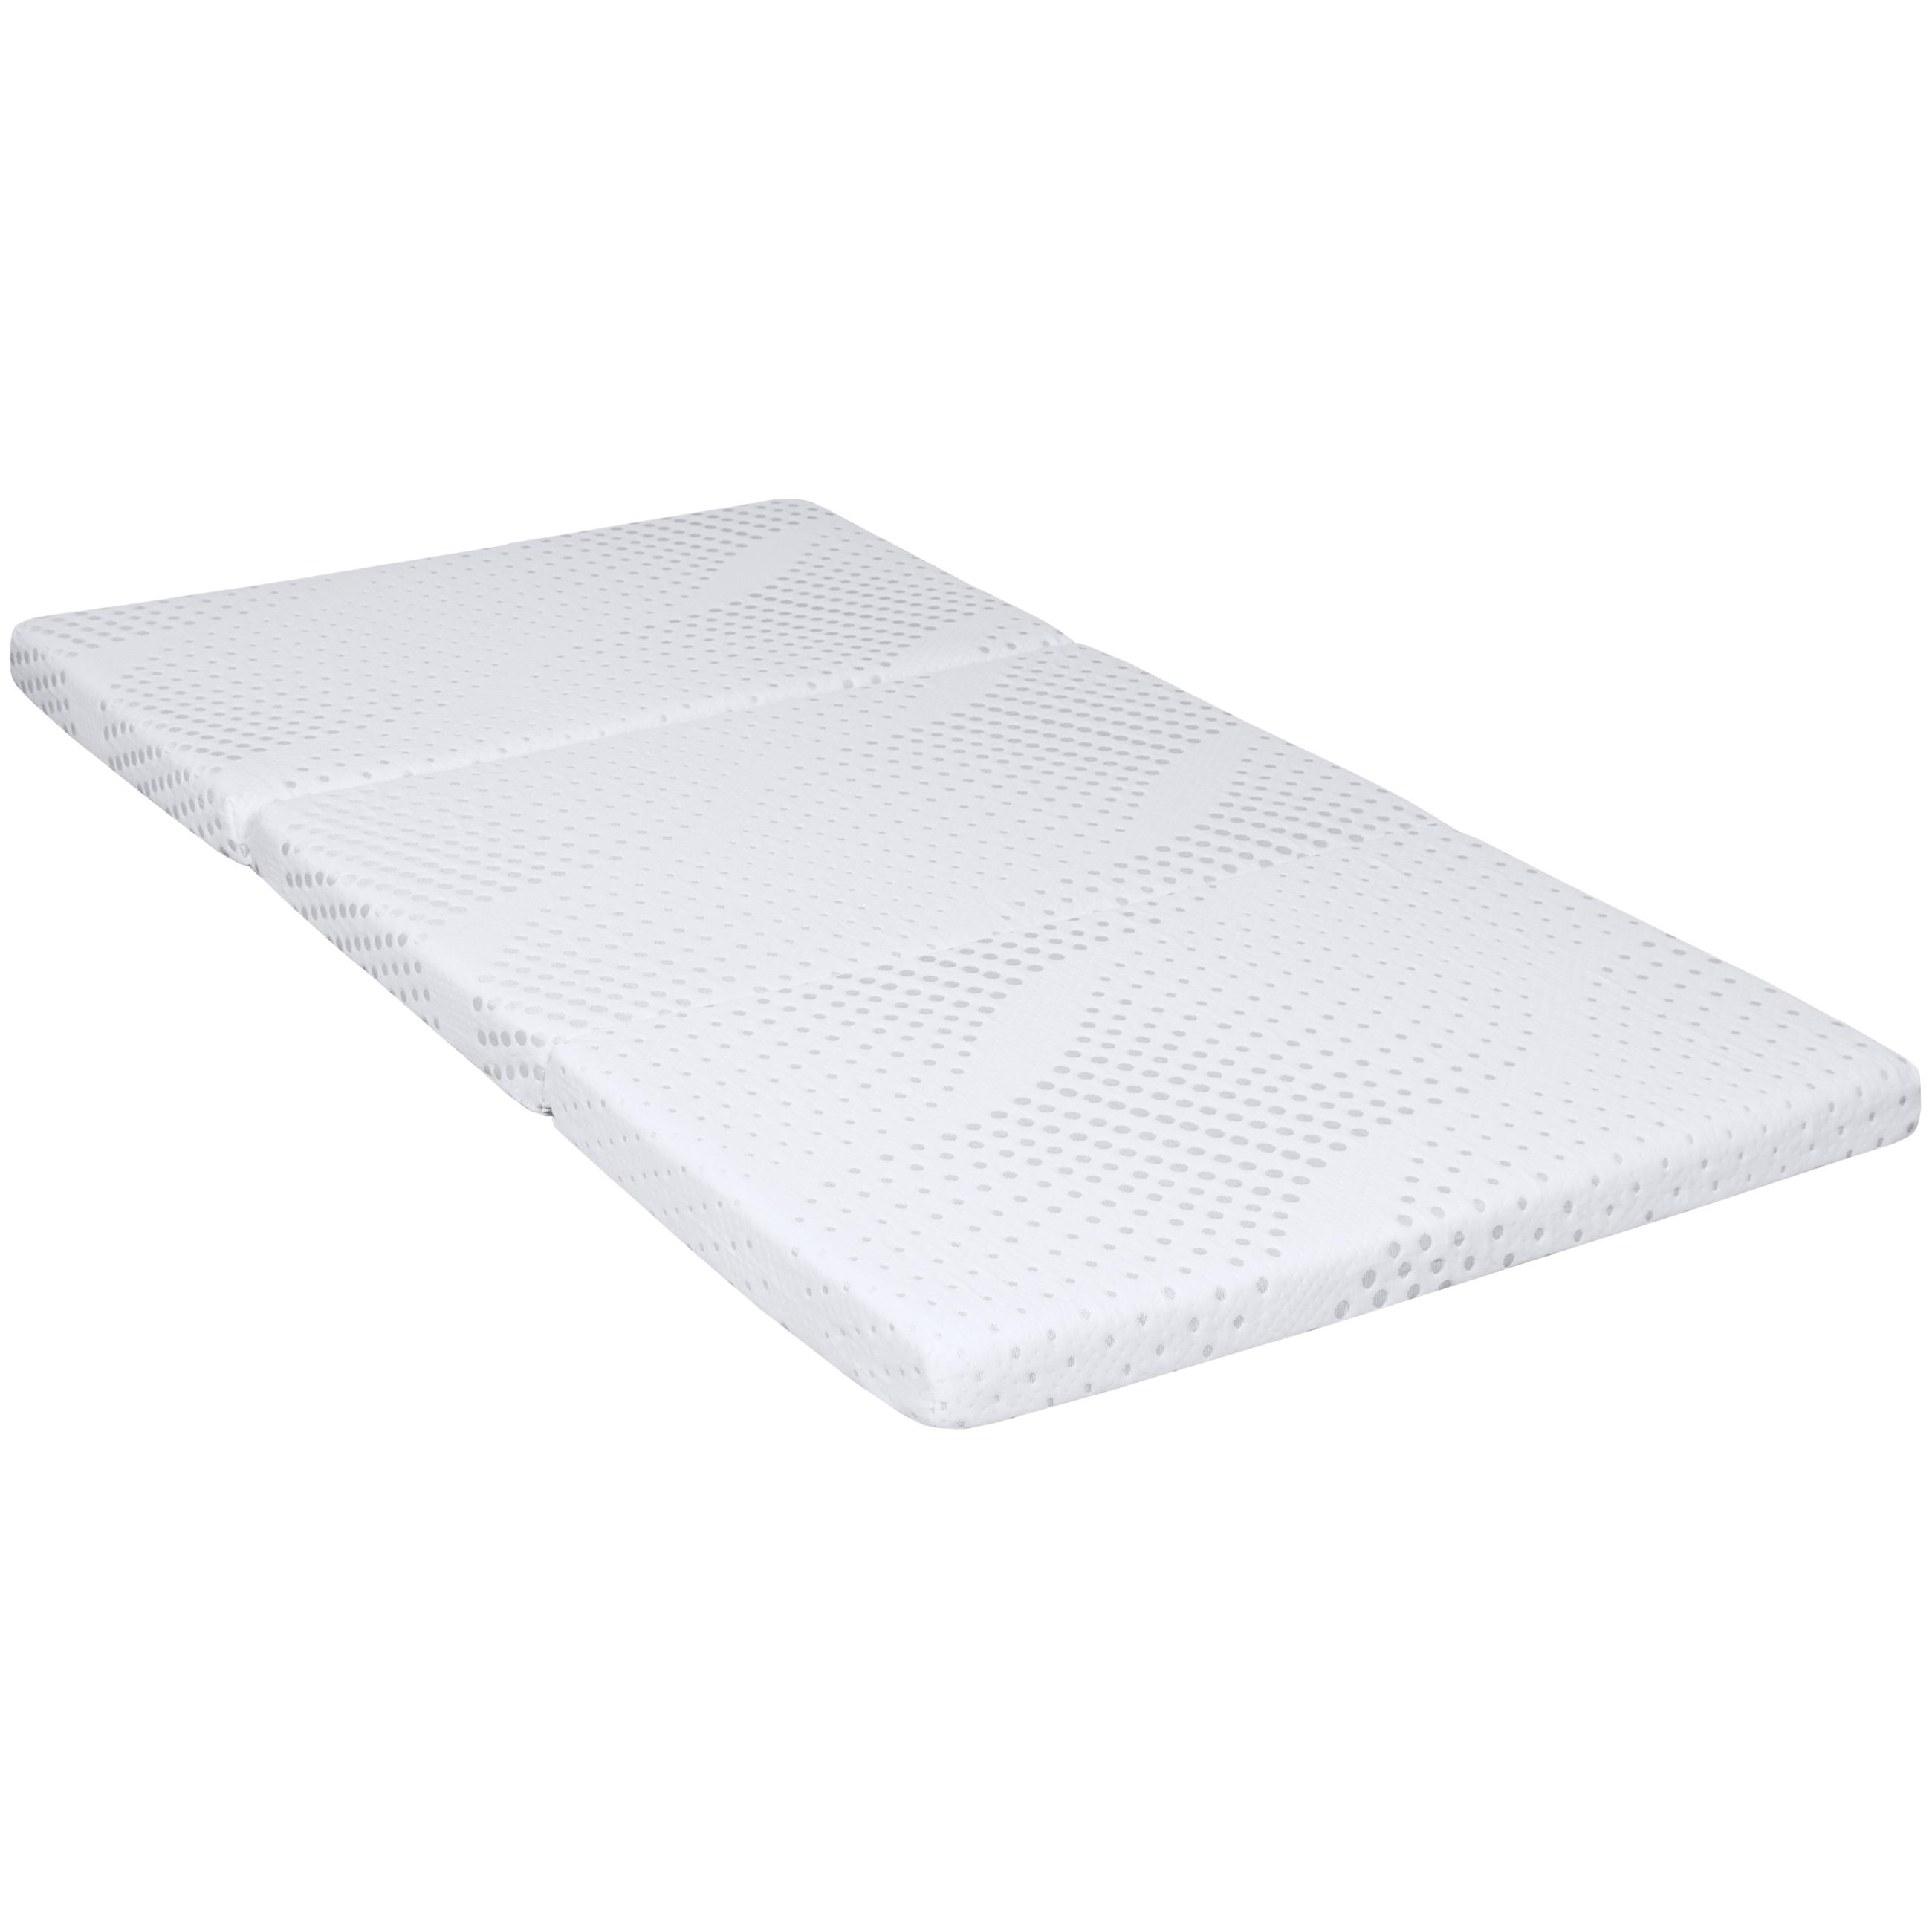 portable 3 tri folding gel memory foam floor mattress twin removable cover ebay. Black Bedroom Furniture Sets. Home Design Ideas